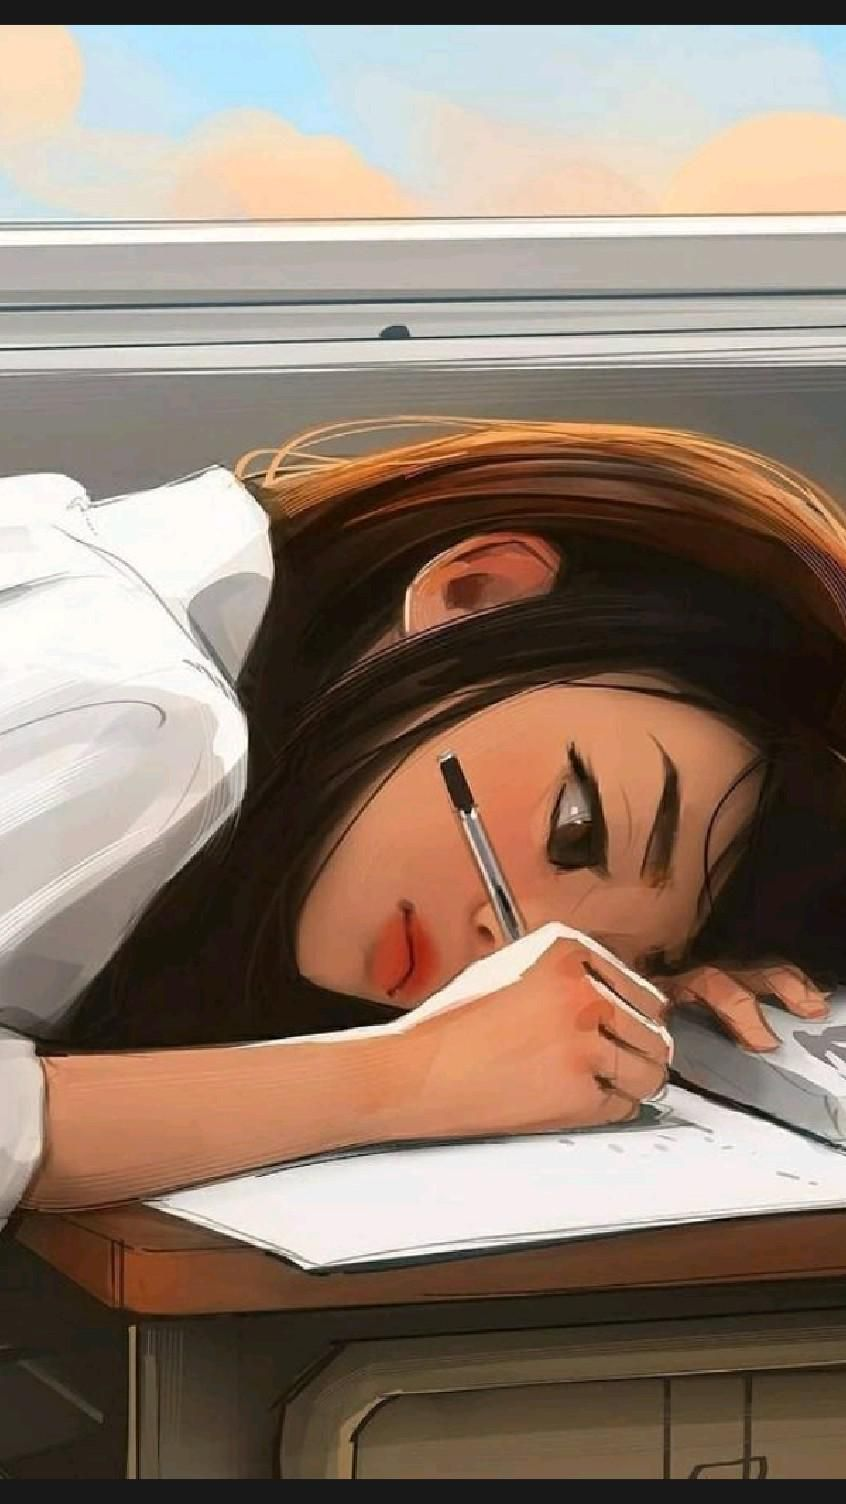 girly illustration 🌹